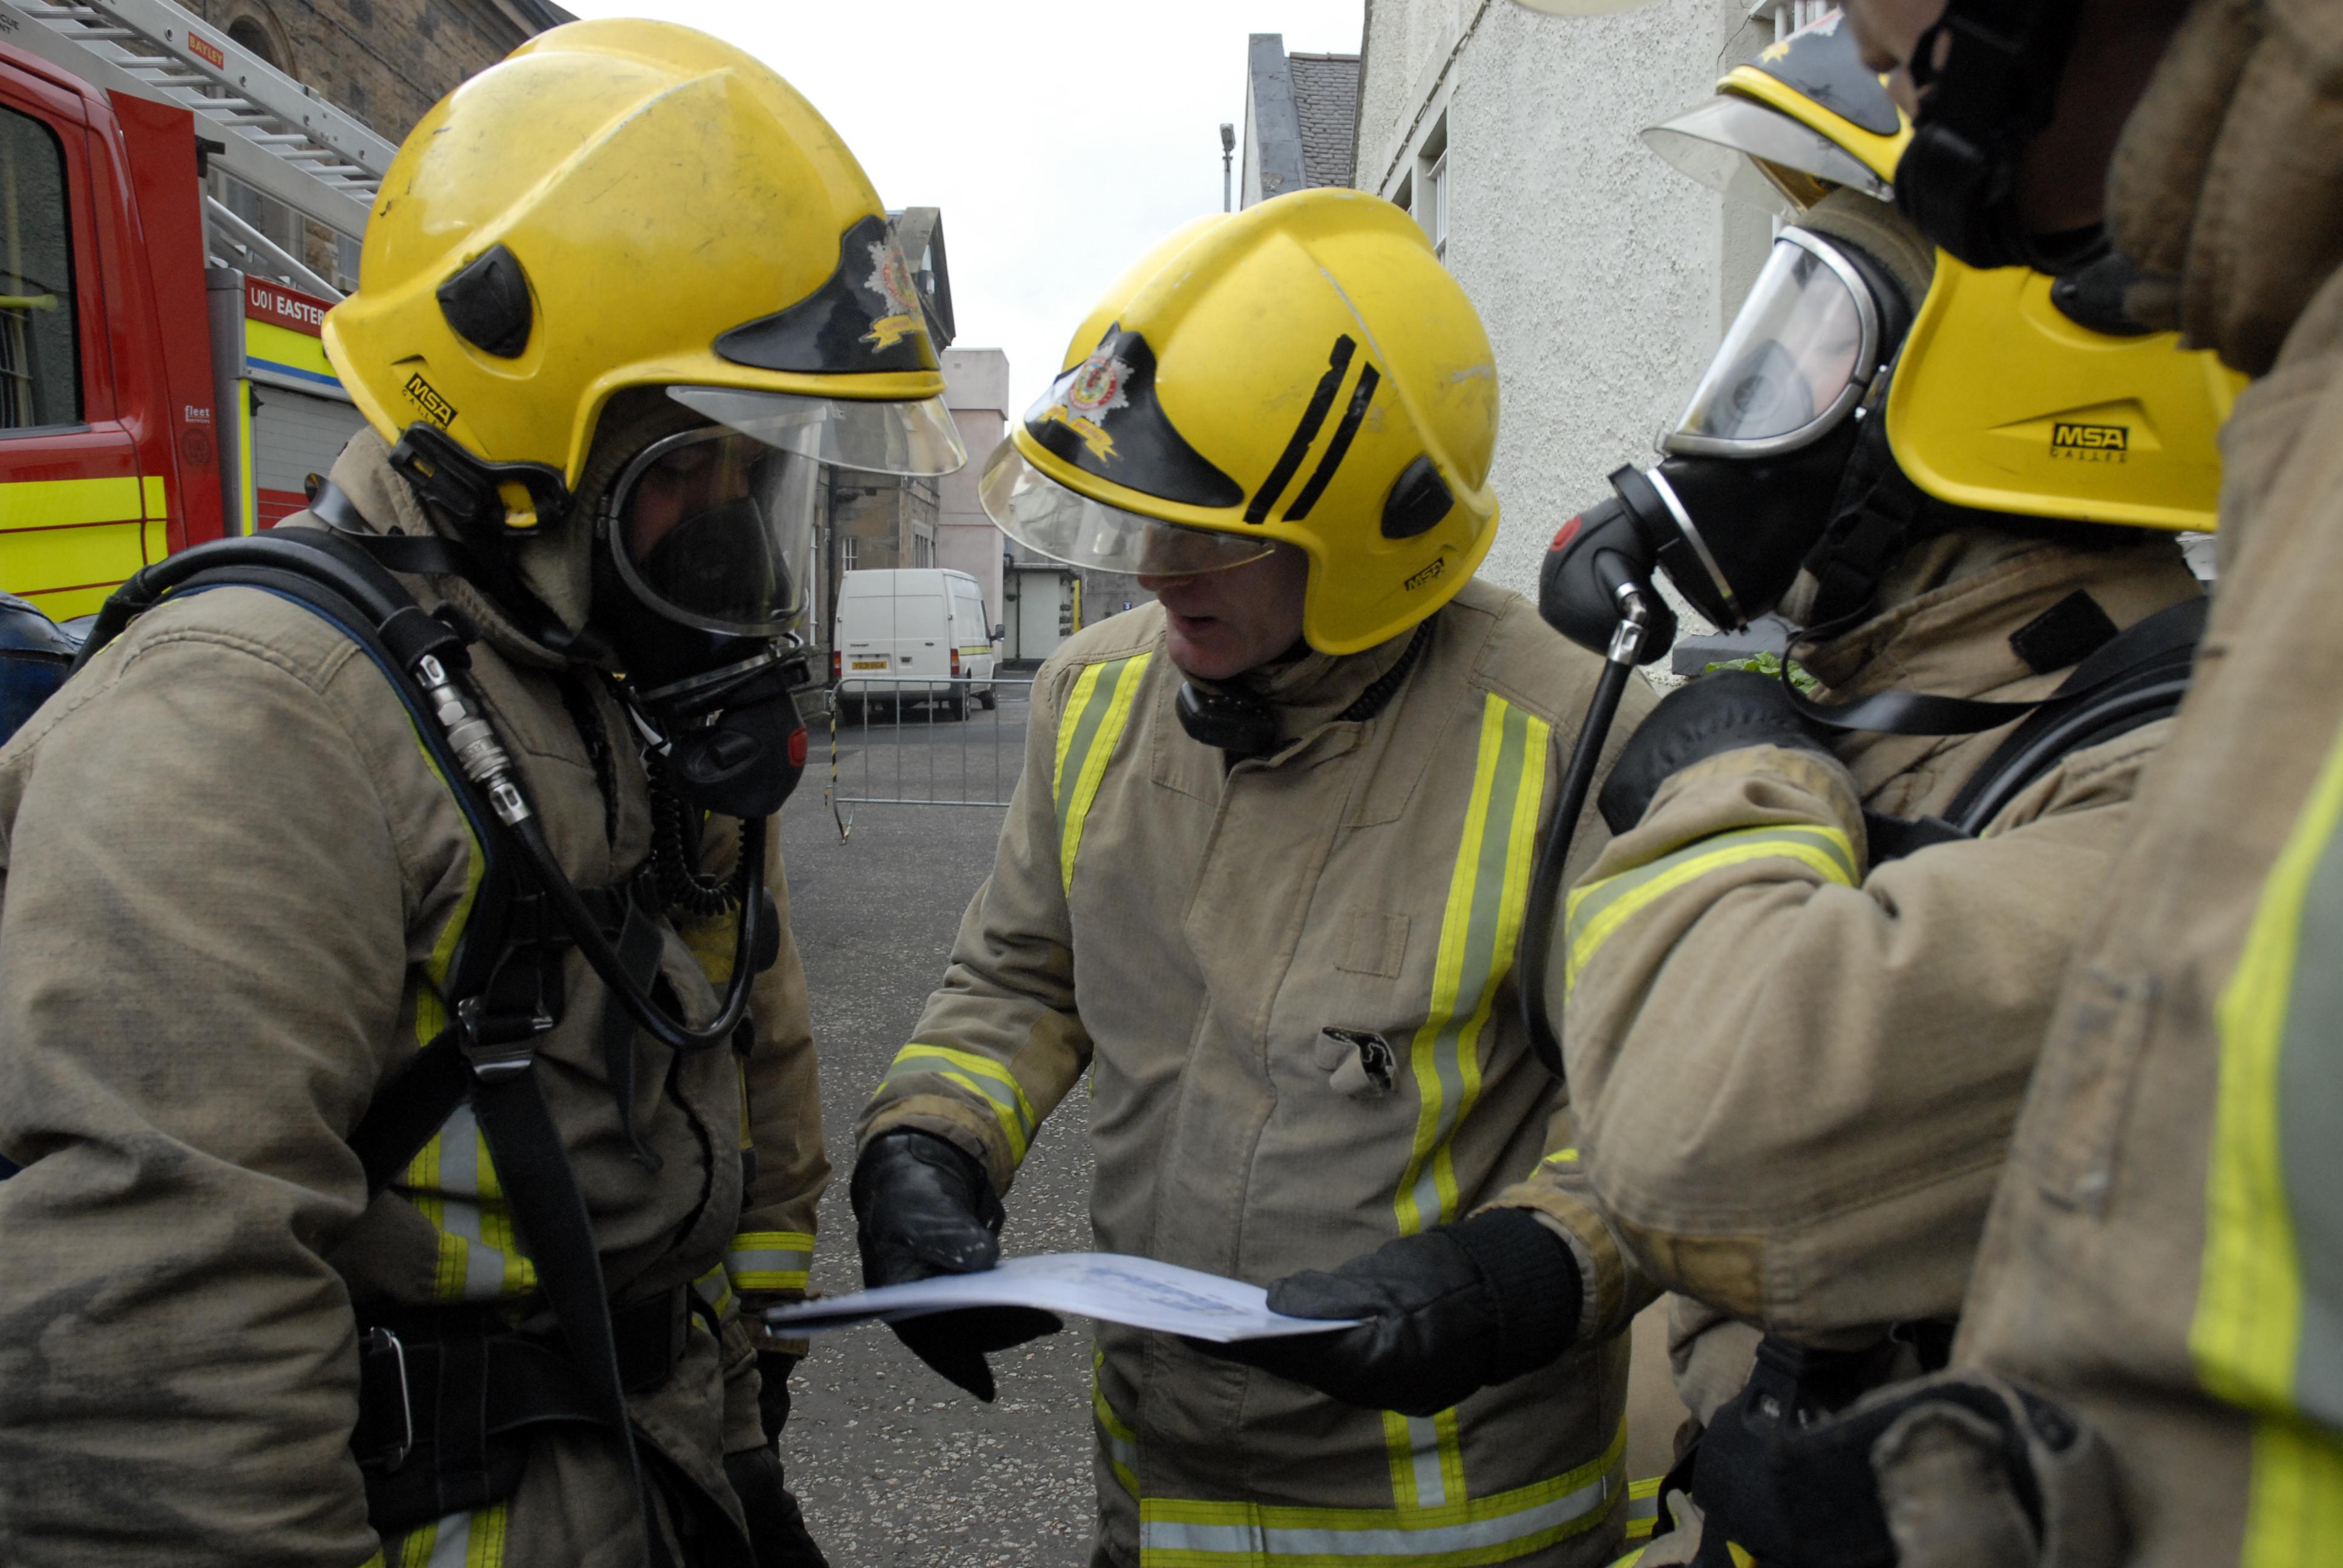 Man suffers smoke inhalation in North Lanarkshire fire